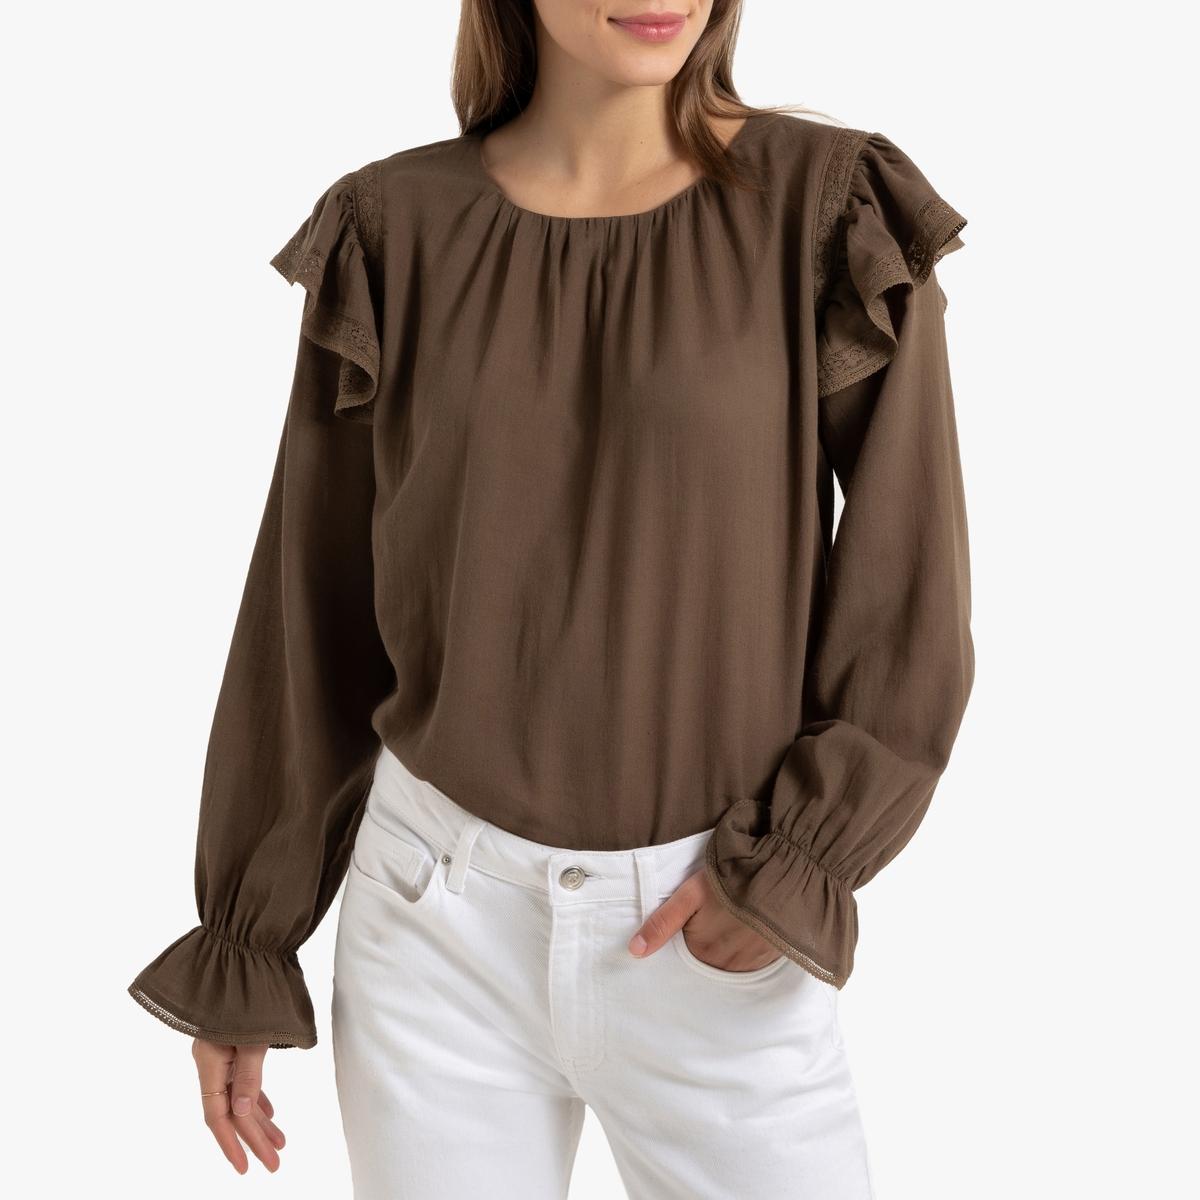 Blusa con volantes, manga larga y cuello redondo